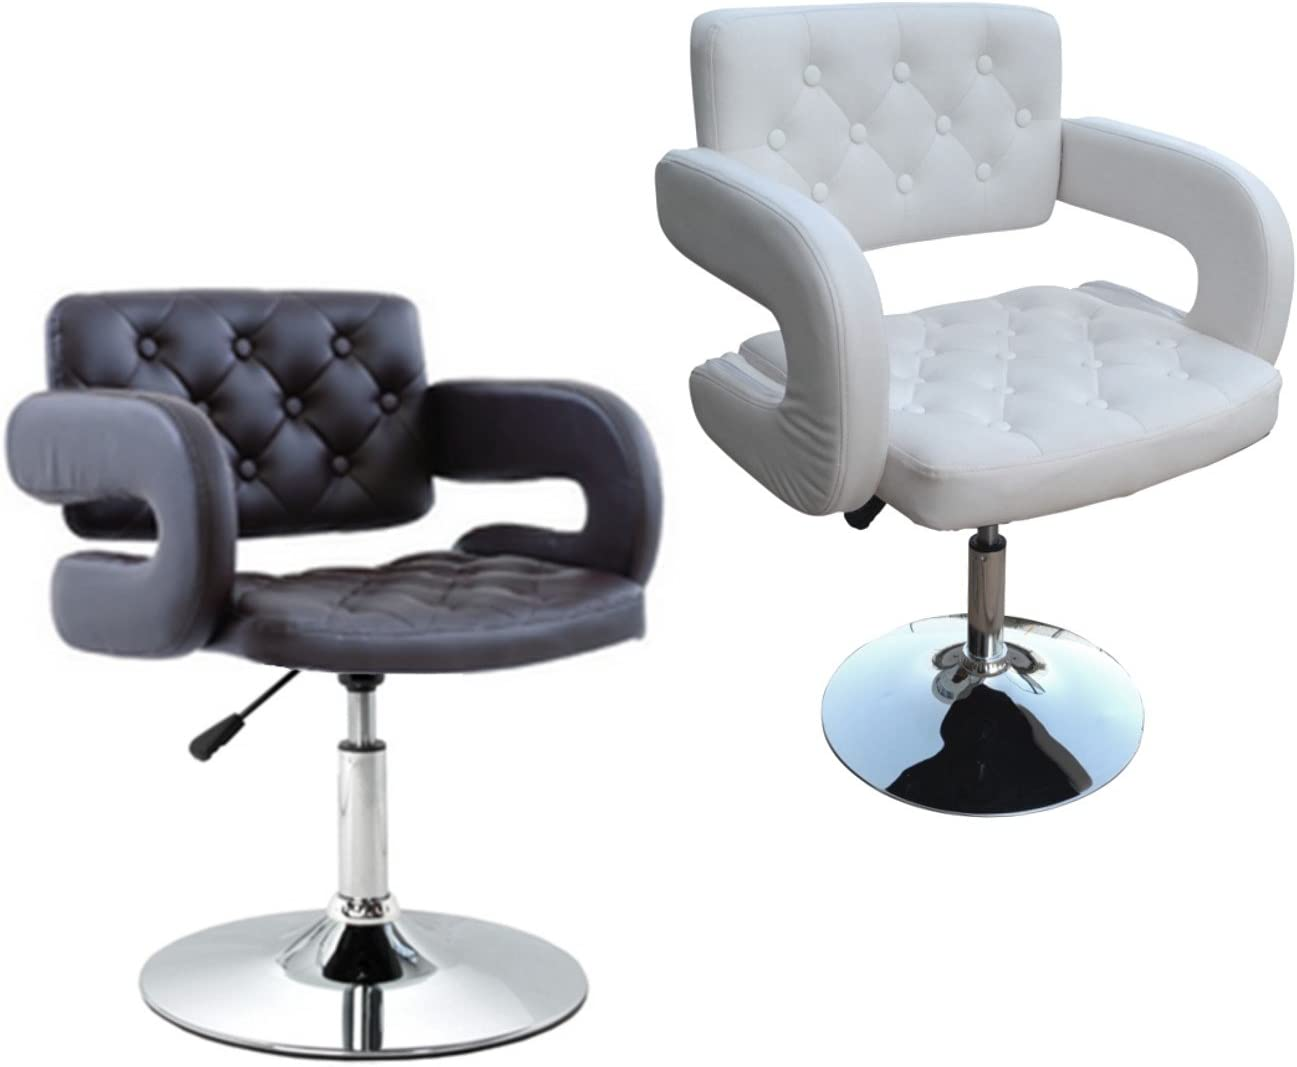 Sillón taburete giratorio elegante de piel sintética para casa, oficina, vestíbulo, hotel, sala de espera, con...